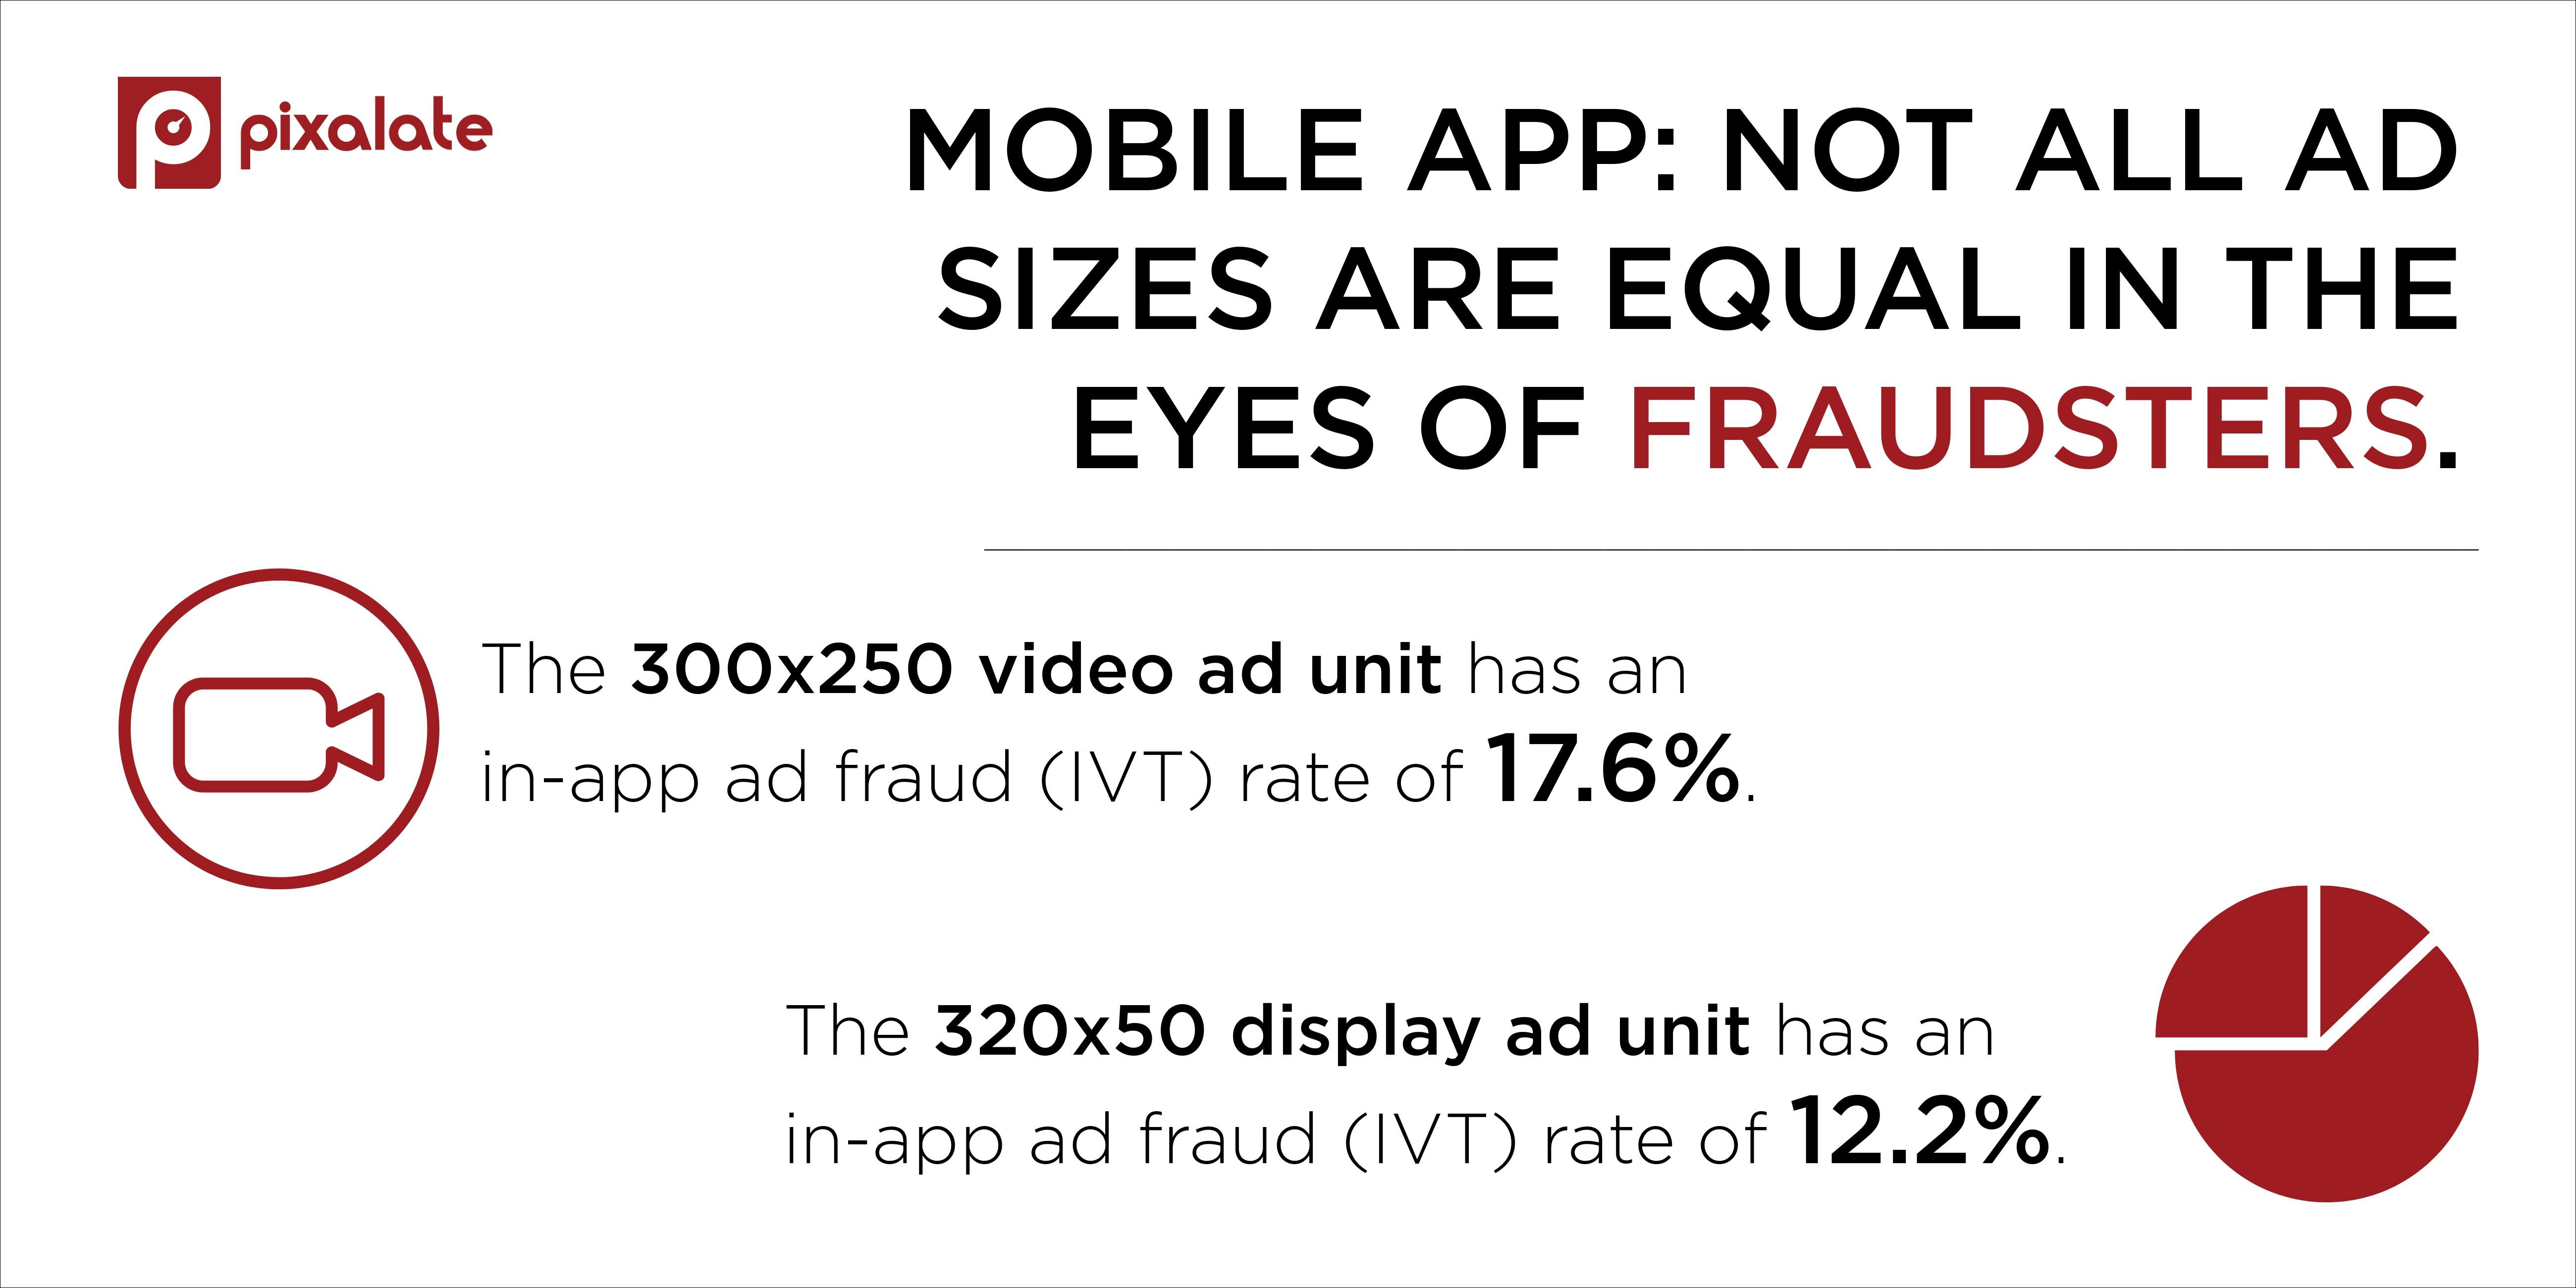 mobile-app-ad-sizes-takeaways